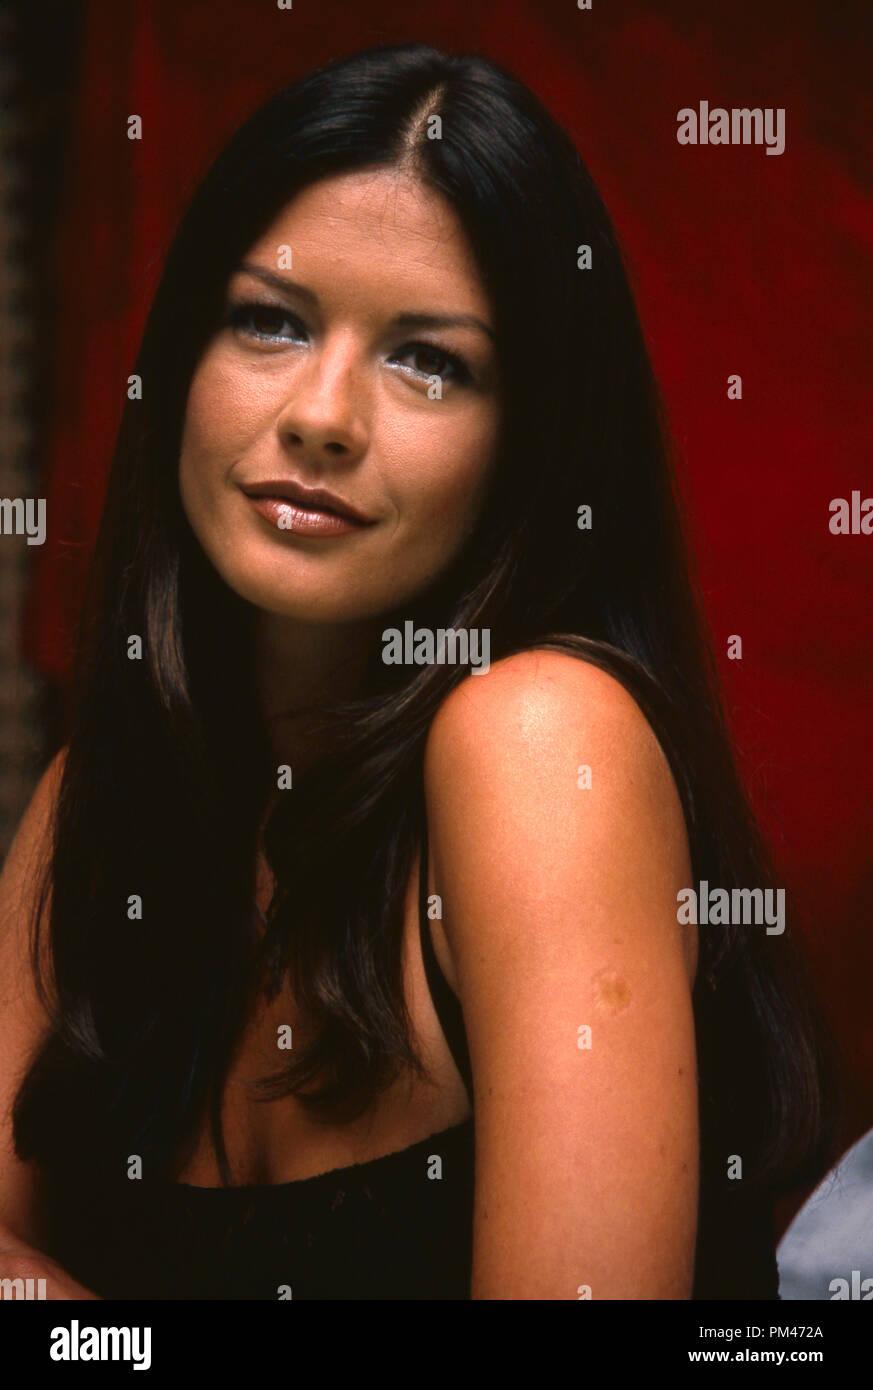 Catherine Zeta-Jones, July 19, 1999. File Reference # 1096_003JRC - Stock Image